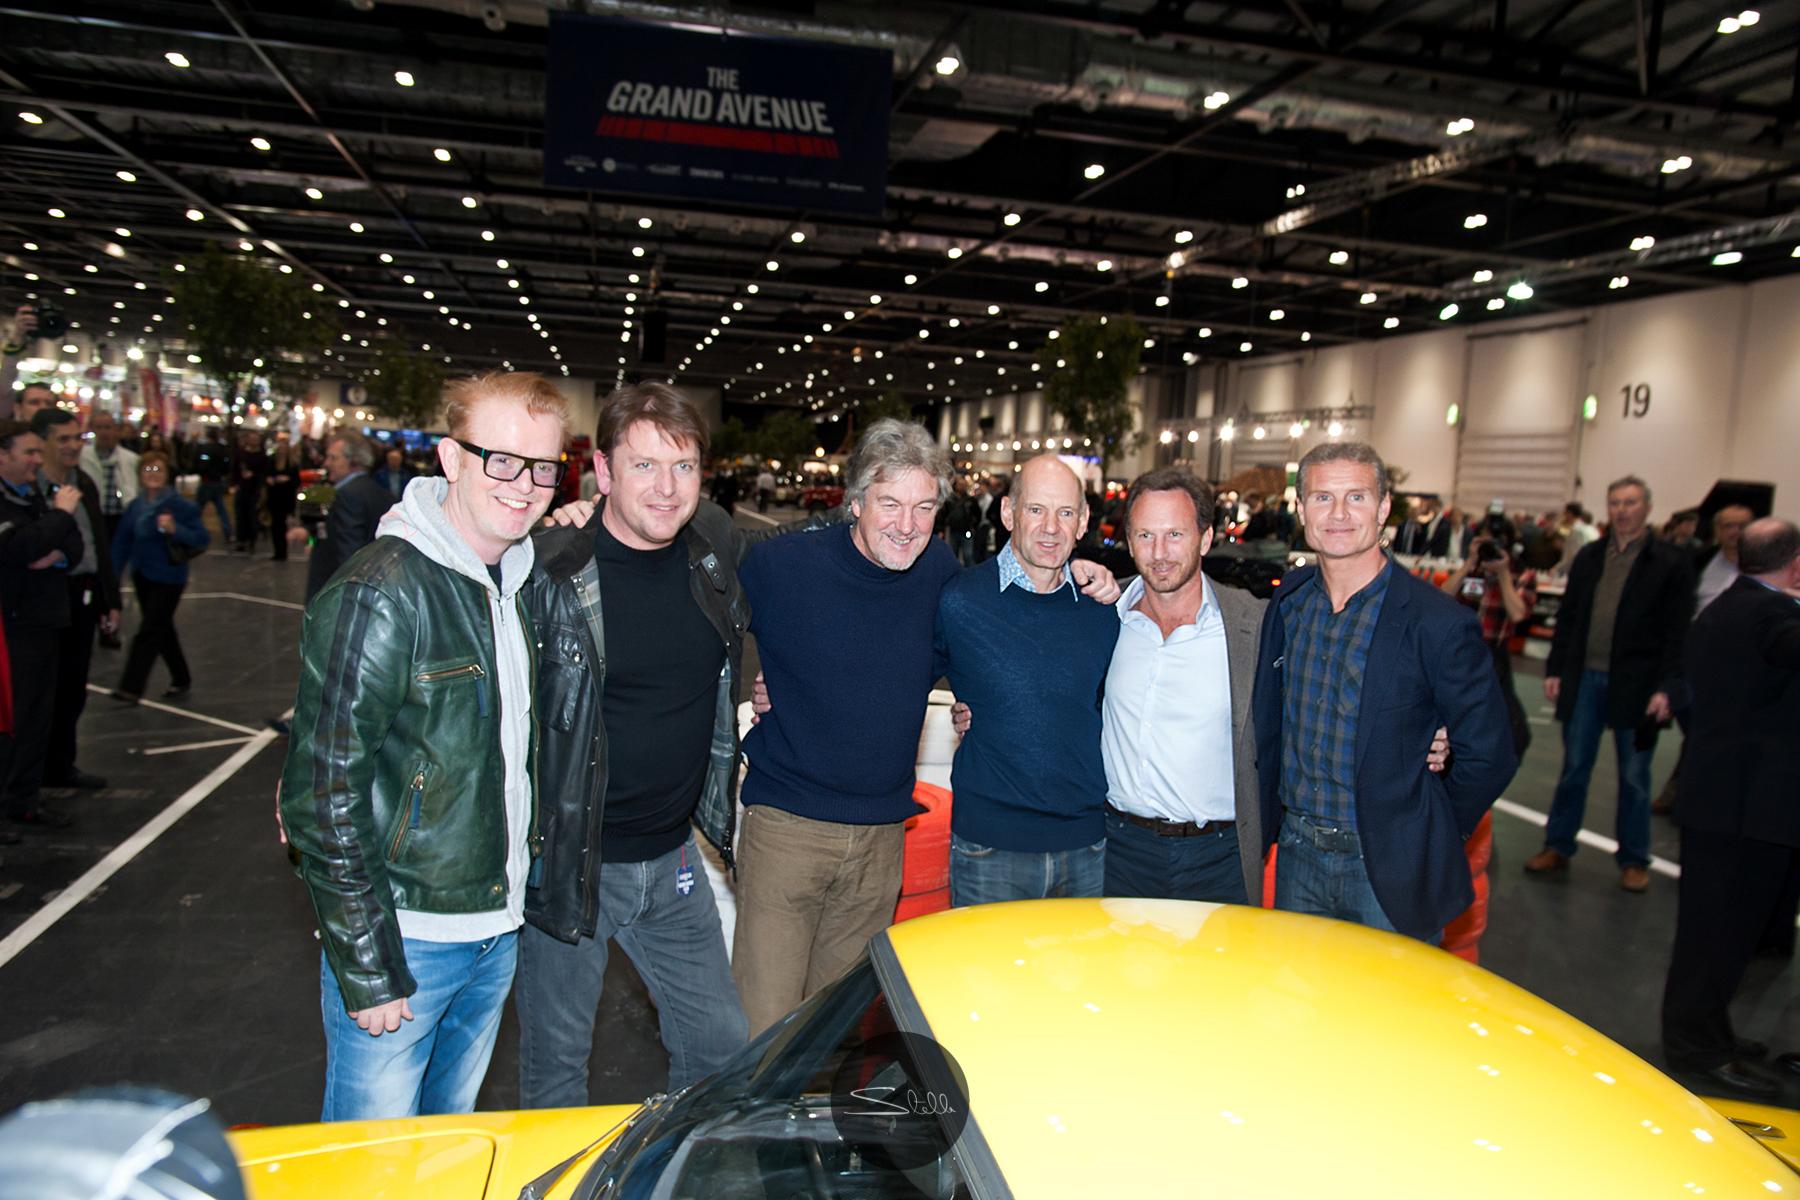 Stella Scordellis London Classic Car Show 2015 6 Watermarked.jpg